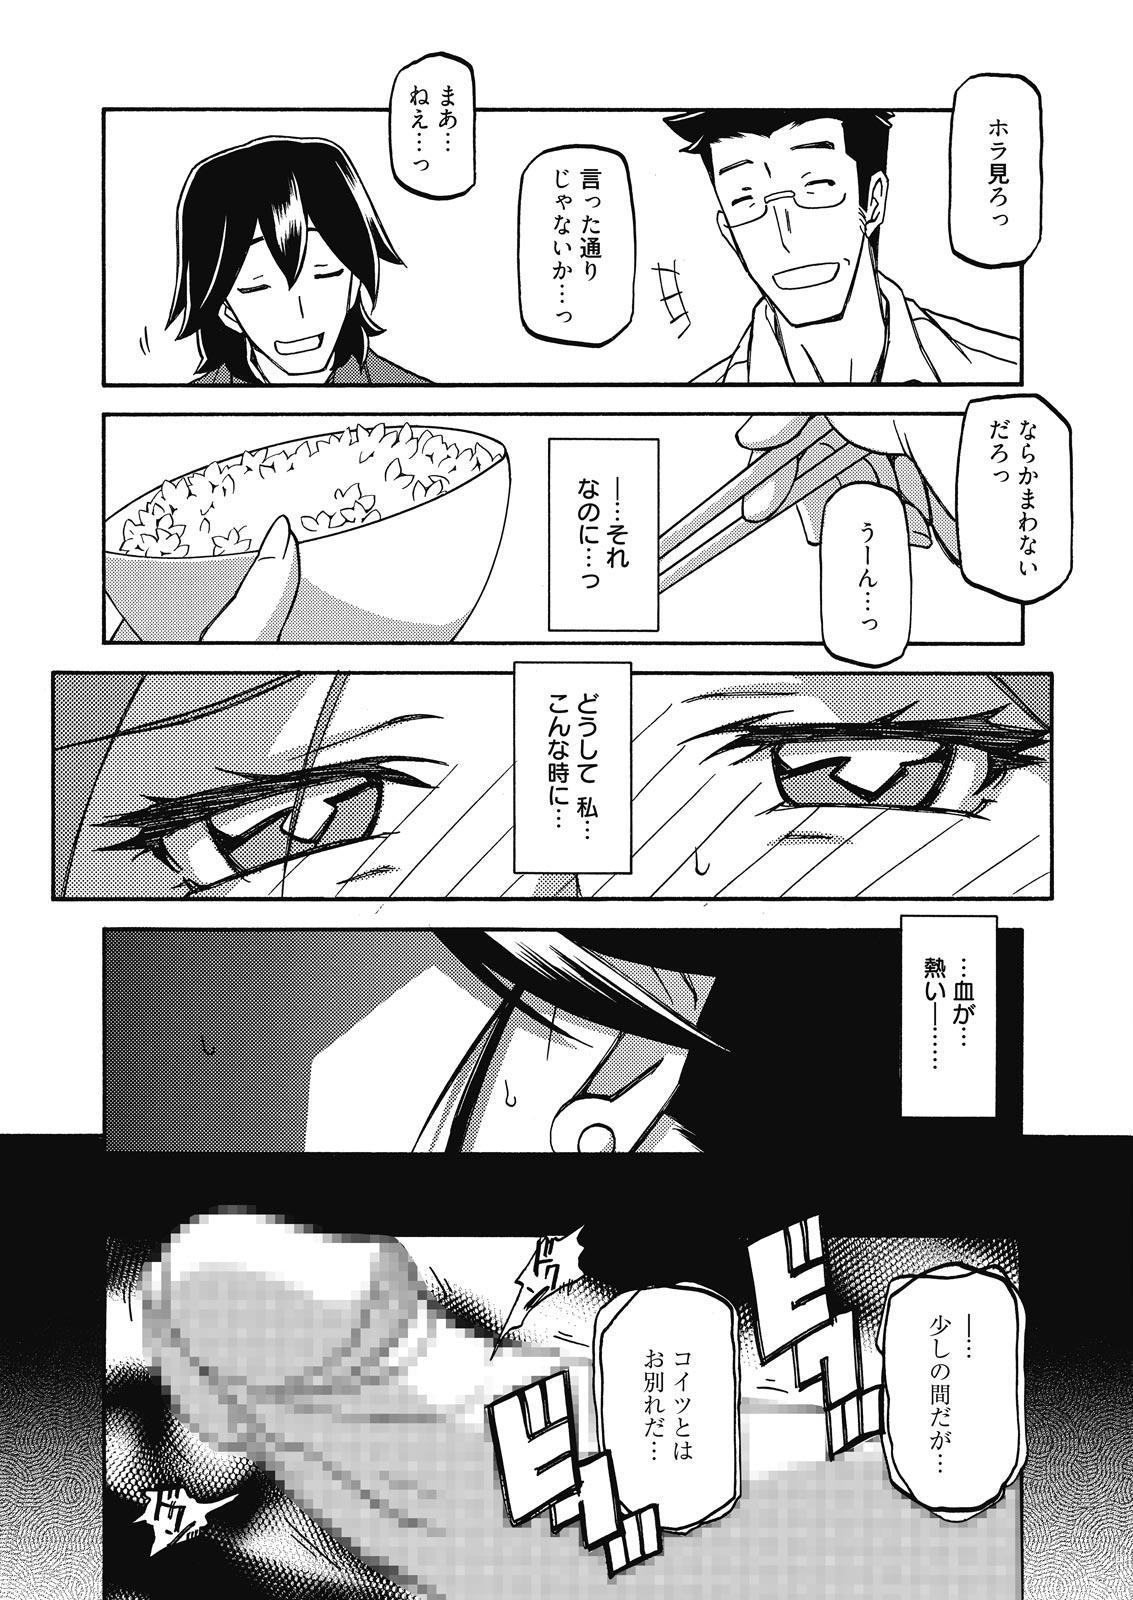 Web Manga Bangaichi Vol. 7 60